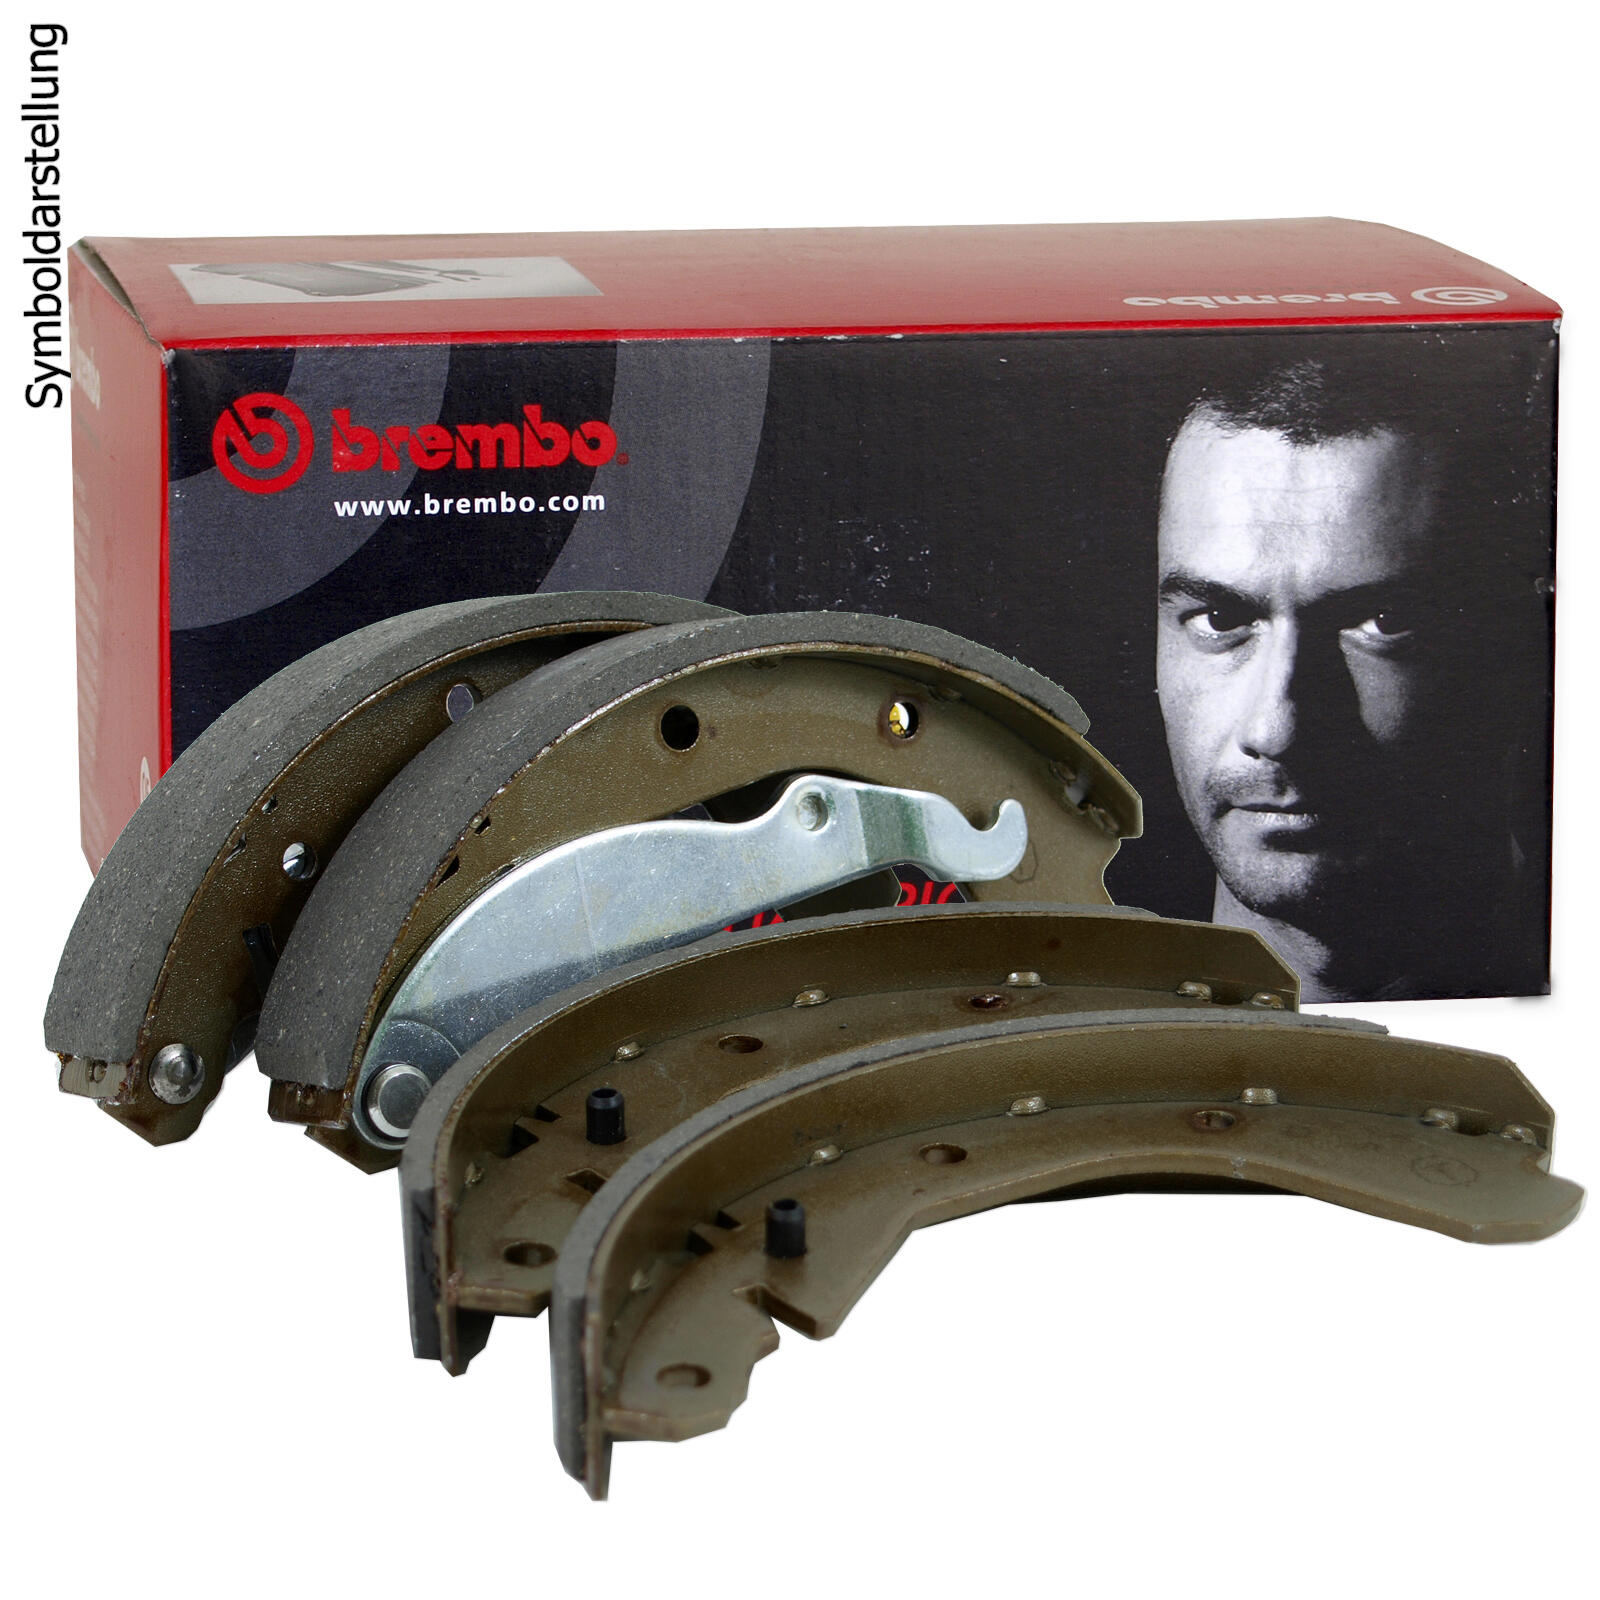 BREMBO Brake Shoe Set